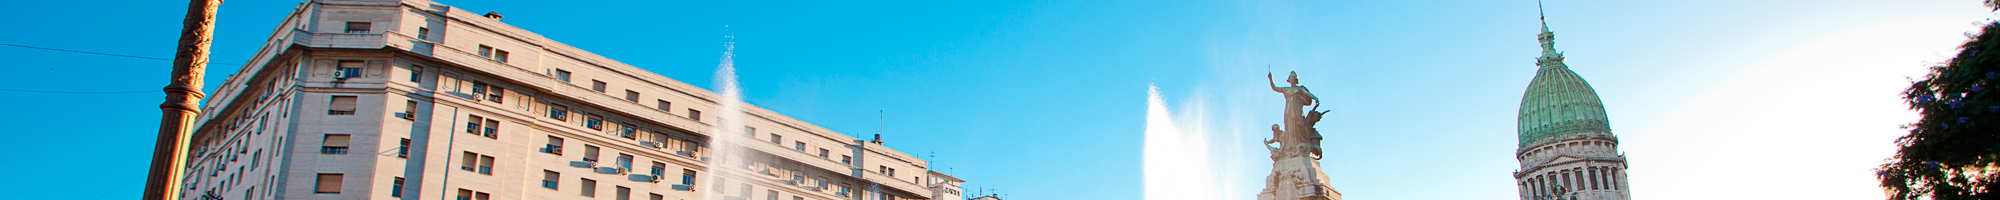 hoteles en Recoleta